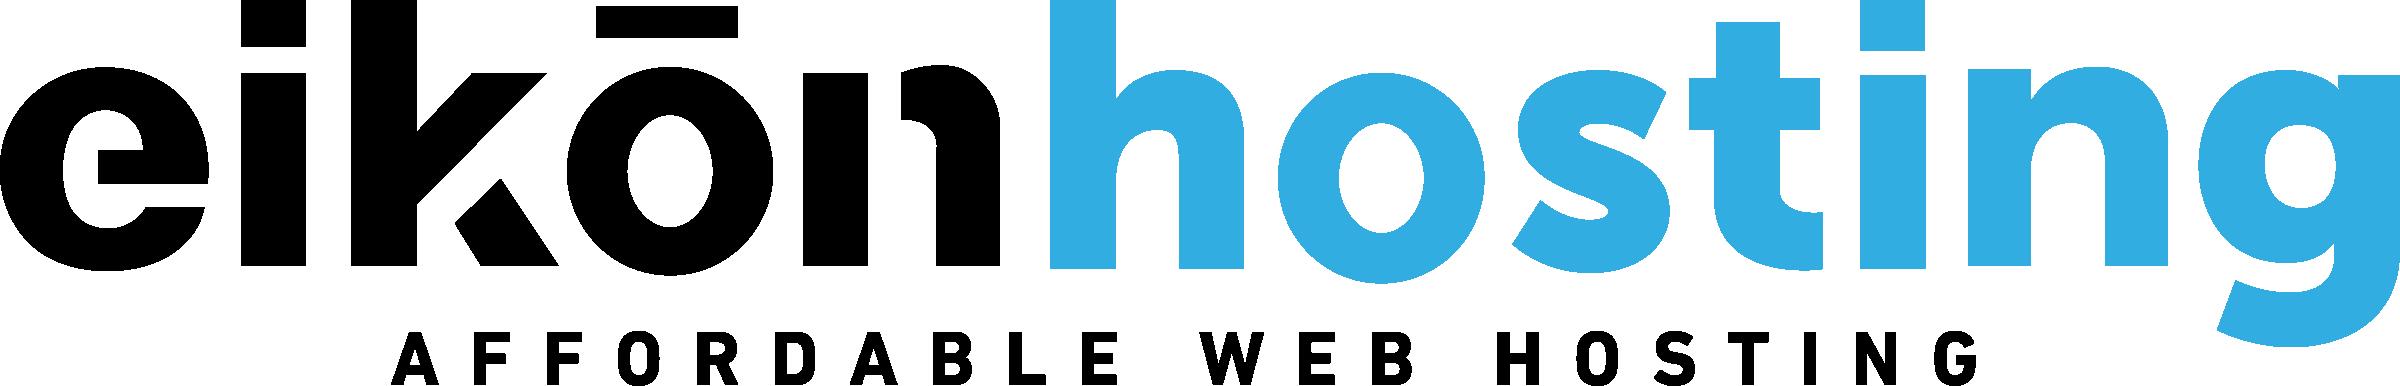 Eikon Hosting